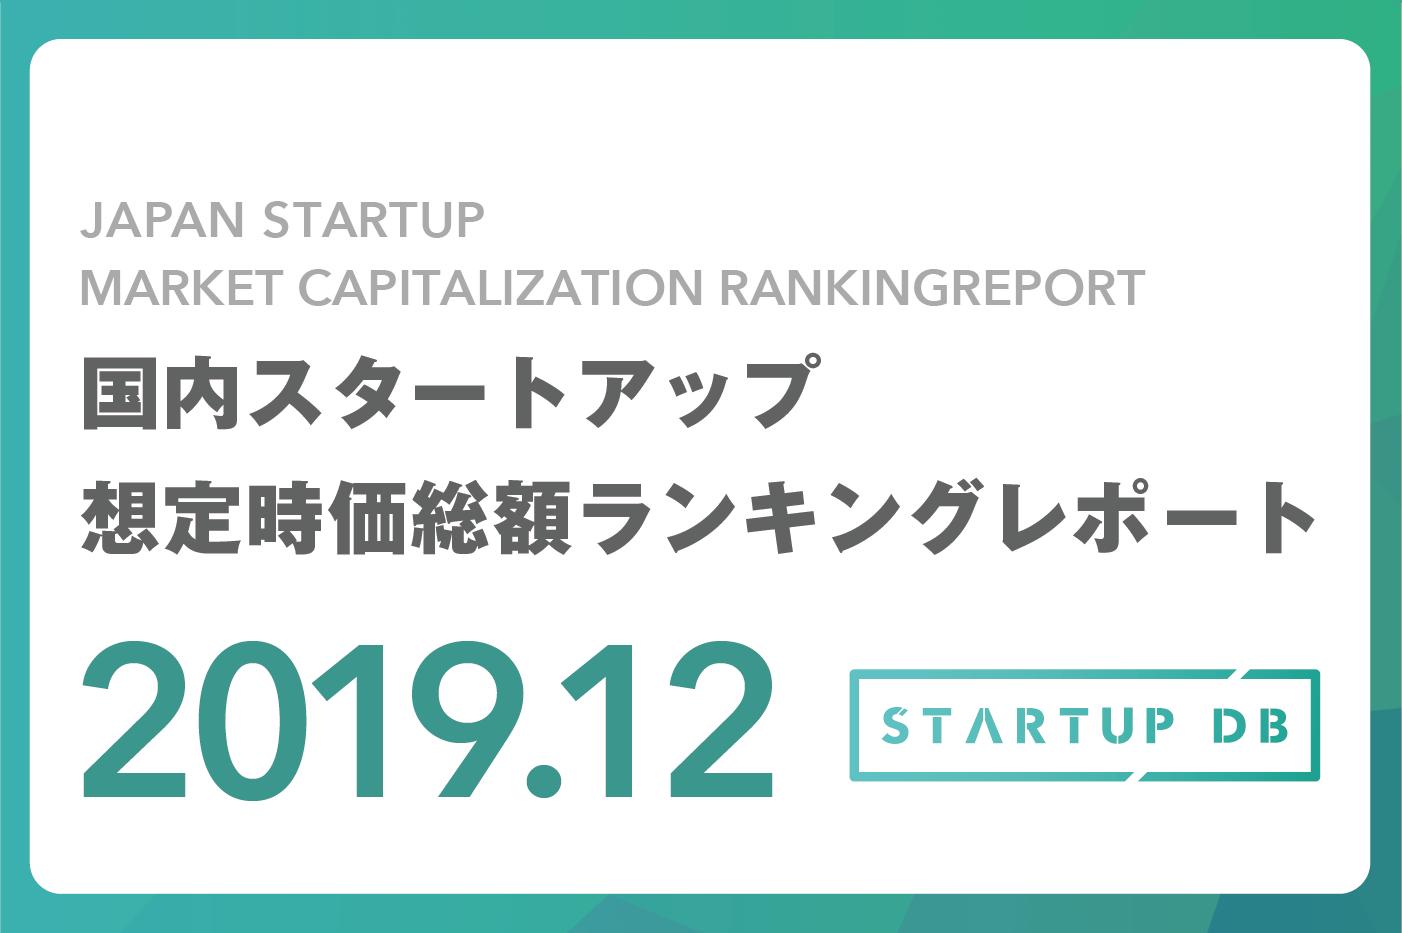 【STARTUP DB】調査結果 国内スタートアップ想定時価総額ランキング2019年12月 Googleが出資した「KARTE」運営のプレイド、新規ランクイン